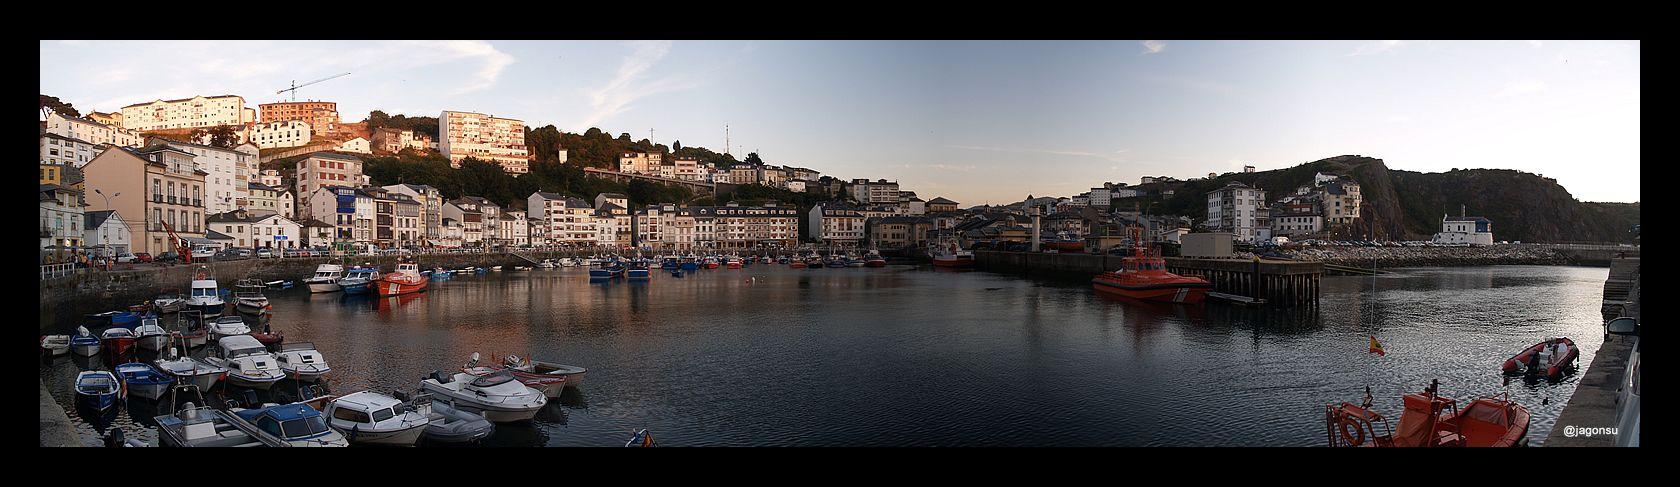 Panor Mica Del Puerto De Luarca Asturias Spain Mis Fotos  # Muebles Luarca Asturias